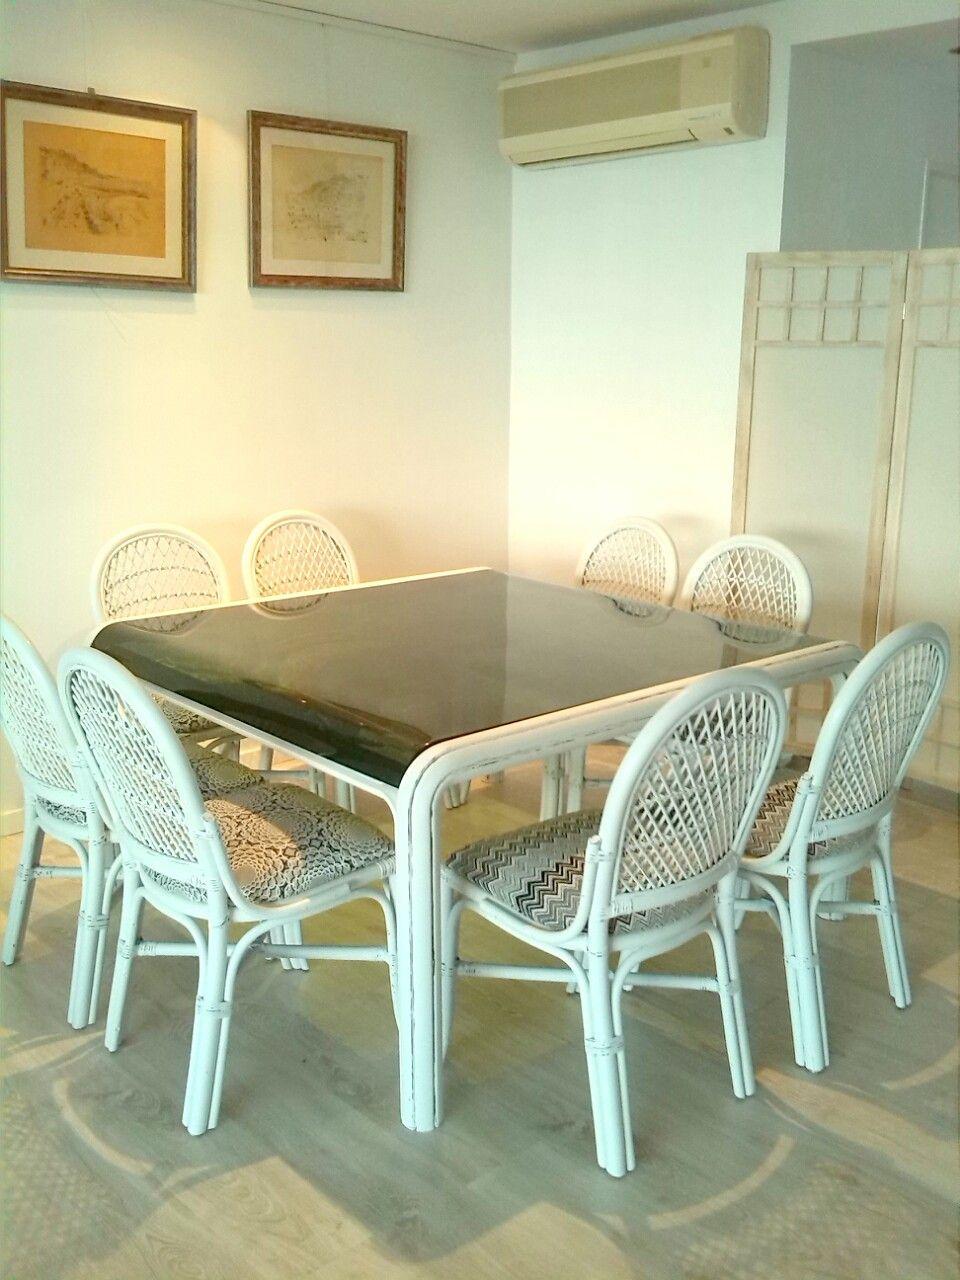 Mesa y sillas pintadas con chalk paint sillas tapizadas for Sillas con apoyabrazos tapizadas